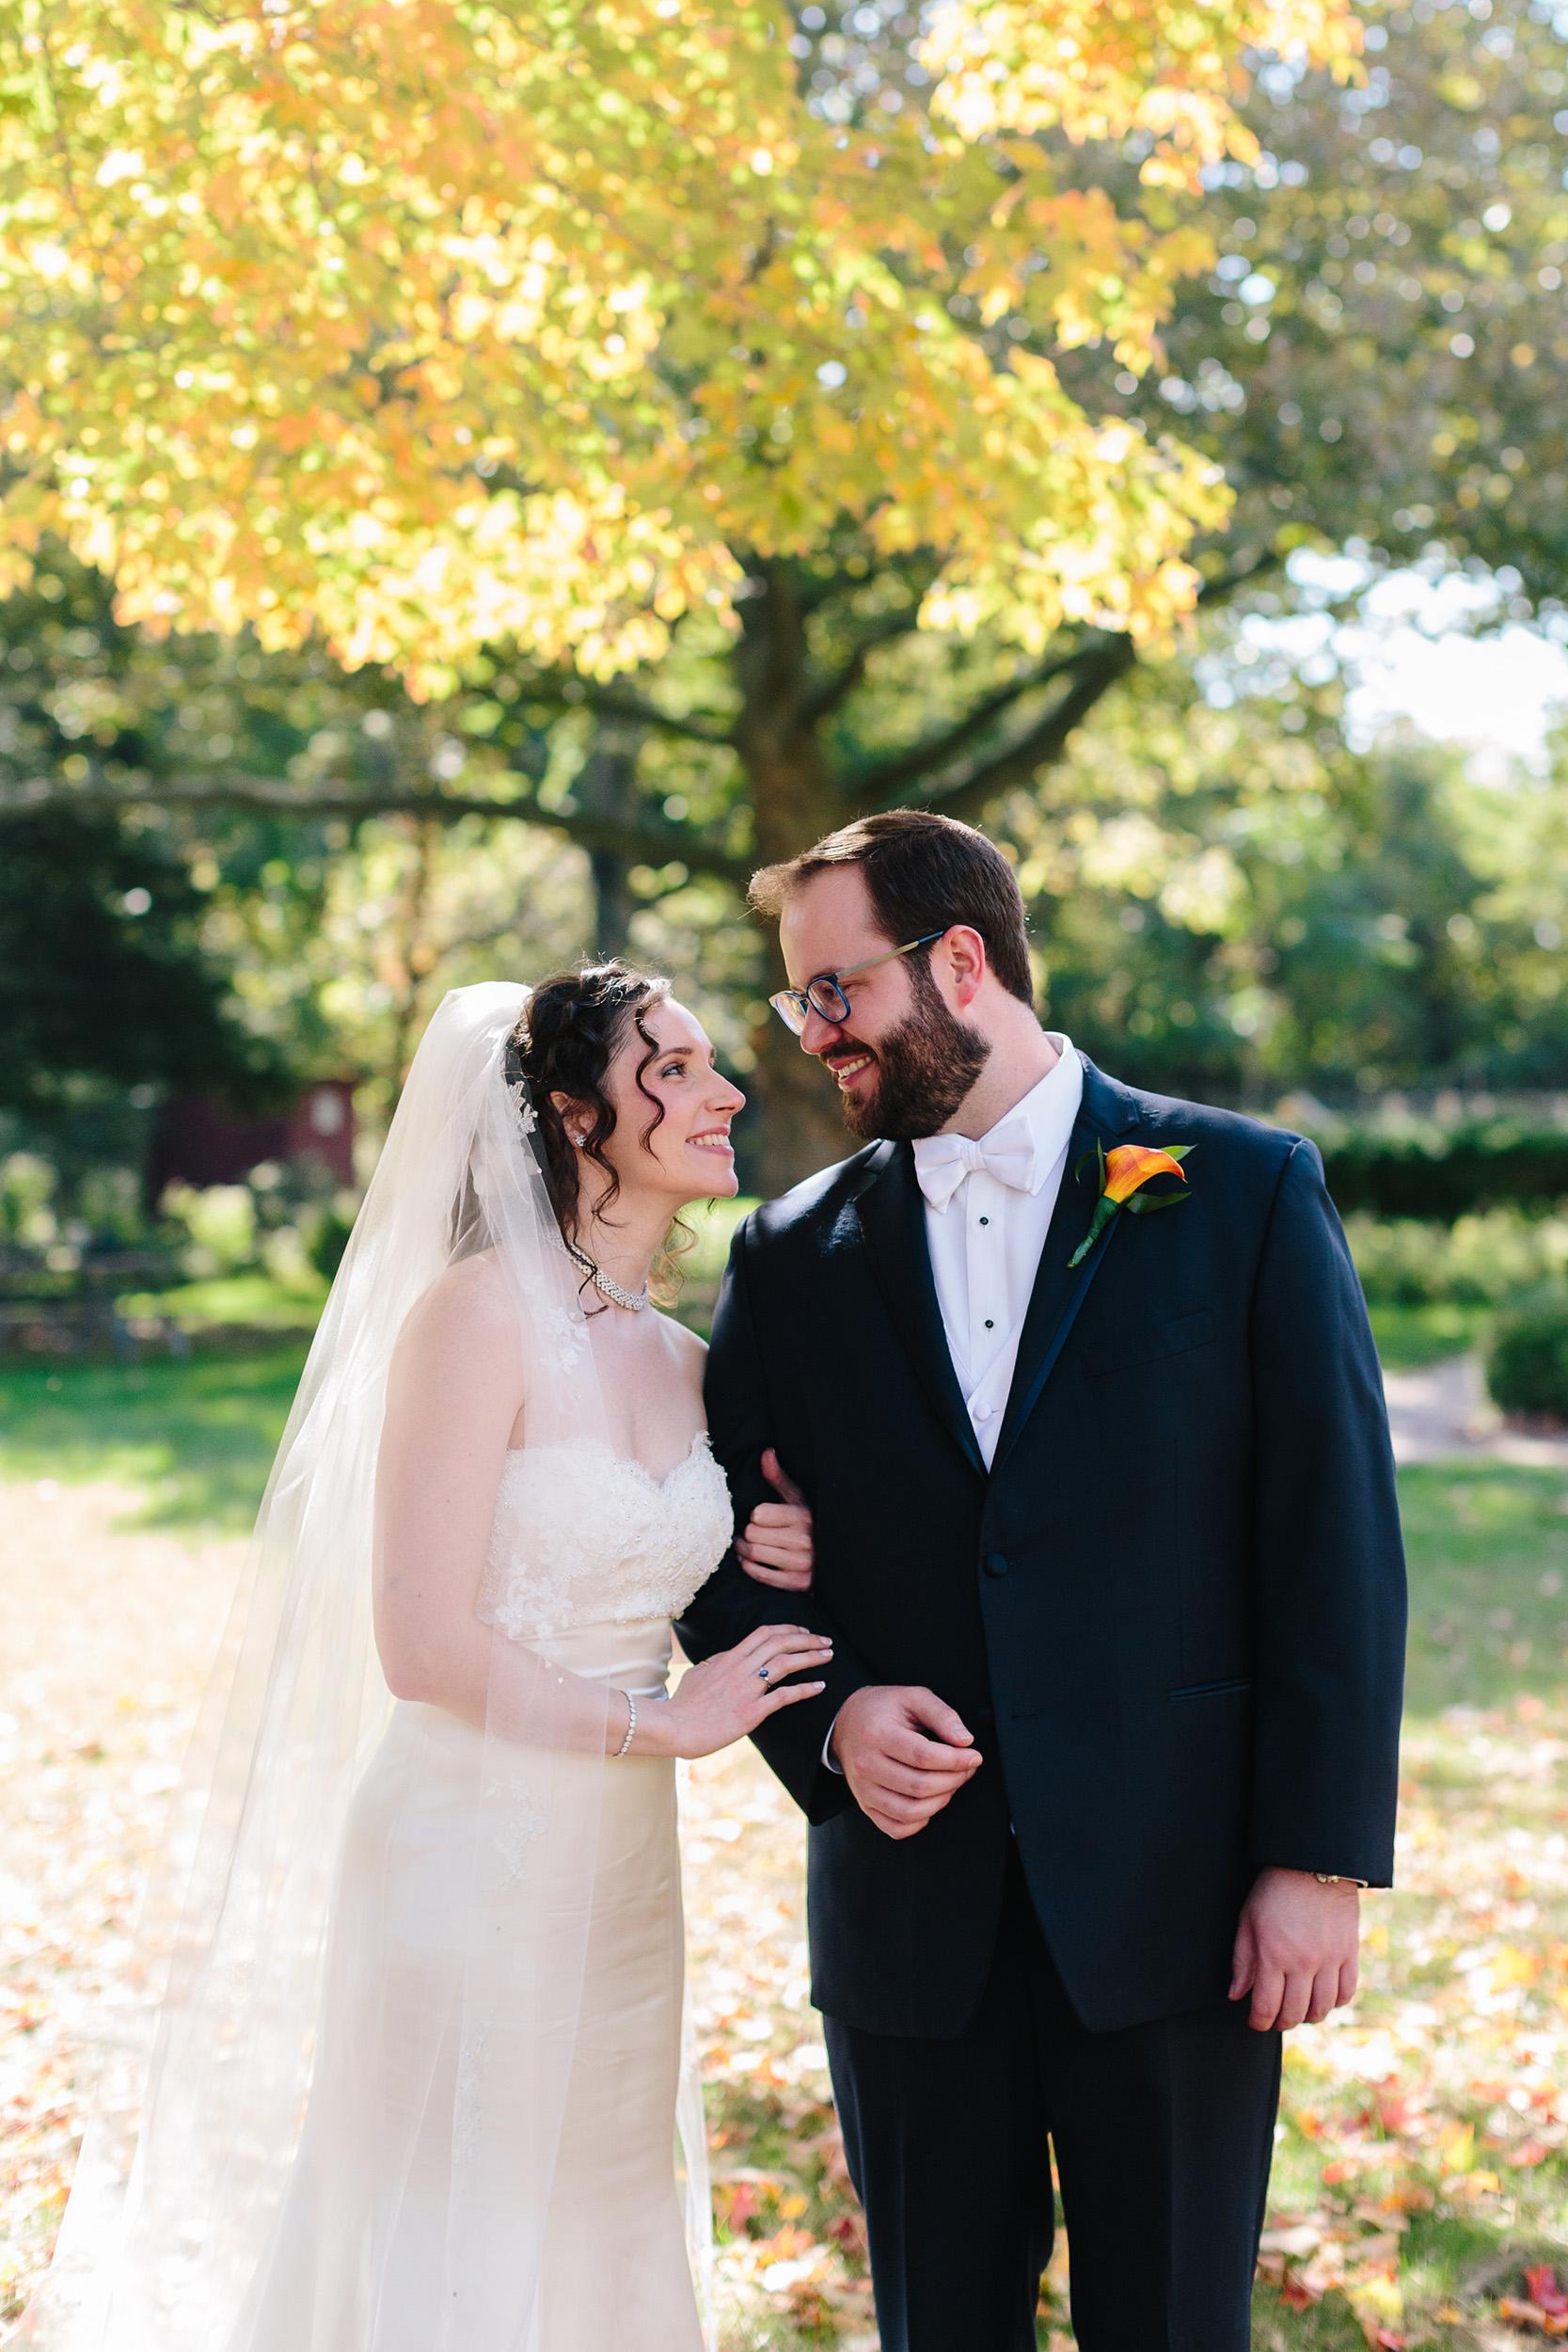 KarliCadel-Wedding-SarahEric-9914.jpg